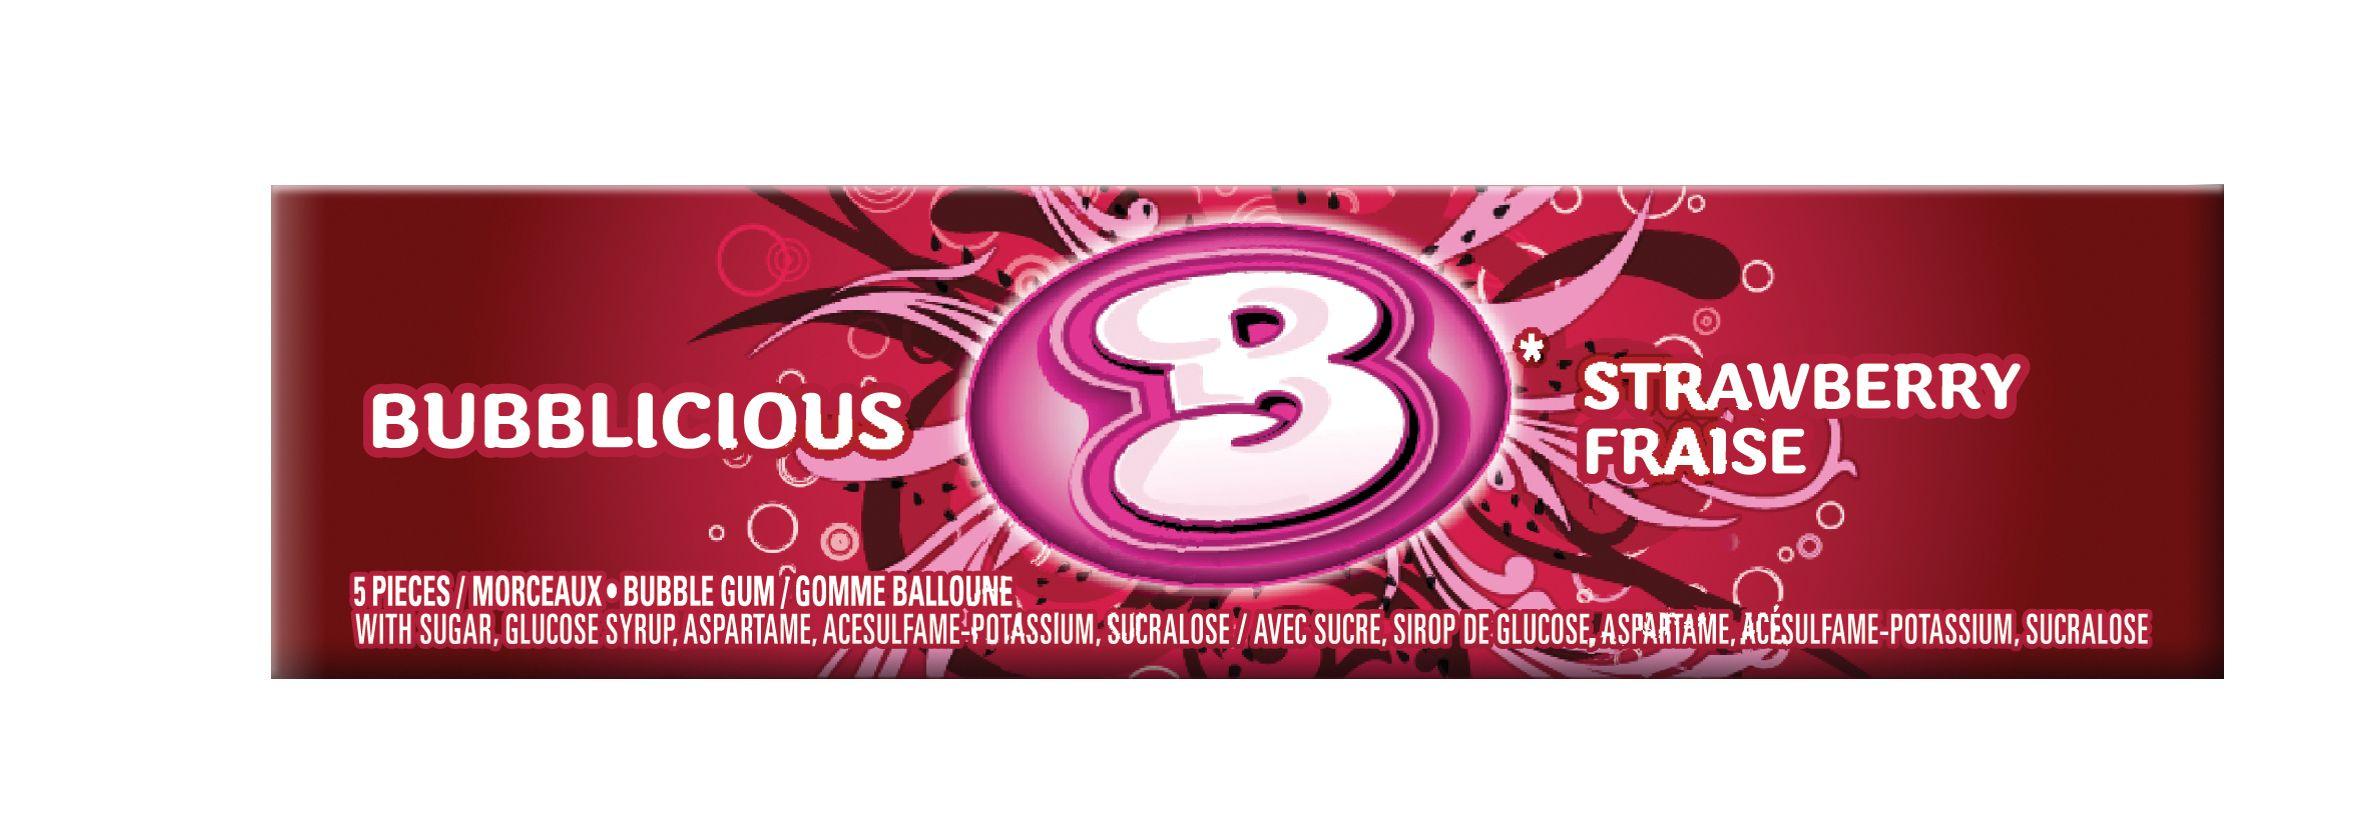 Bubblicious Strawberry Gum 5 Count